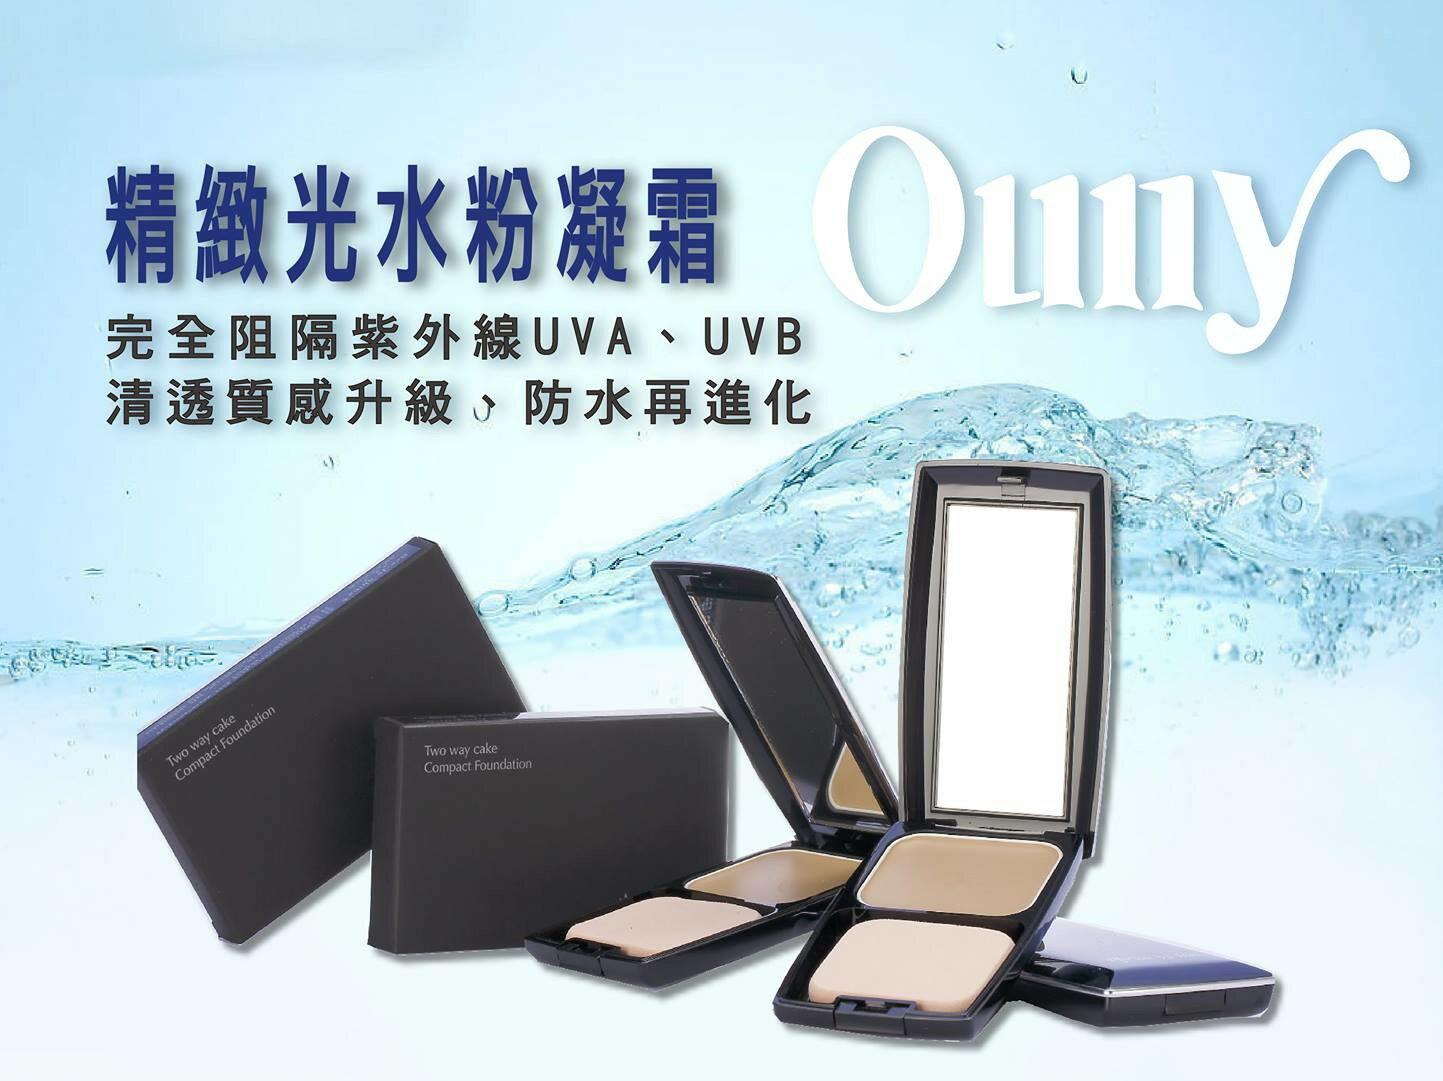 【Ouny歐尼】x 【NEW 夏日大作戰】【精緻水光粉凝霜15g】